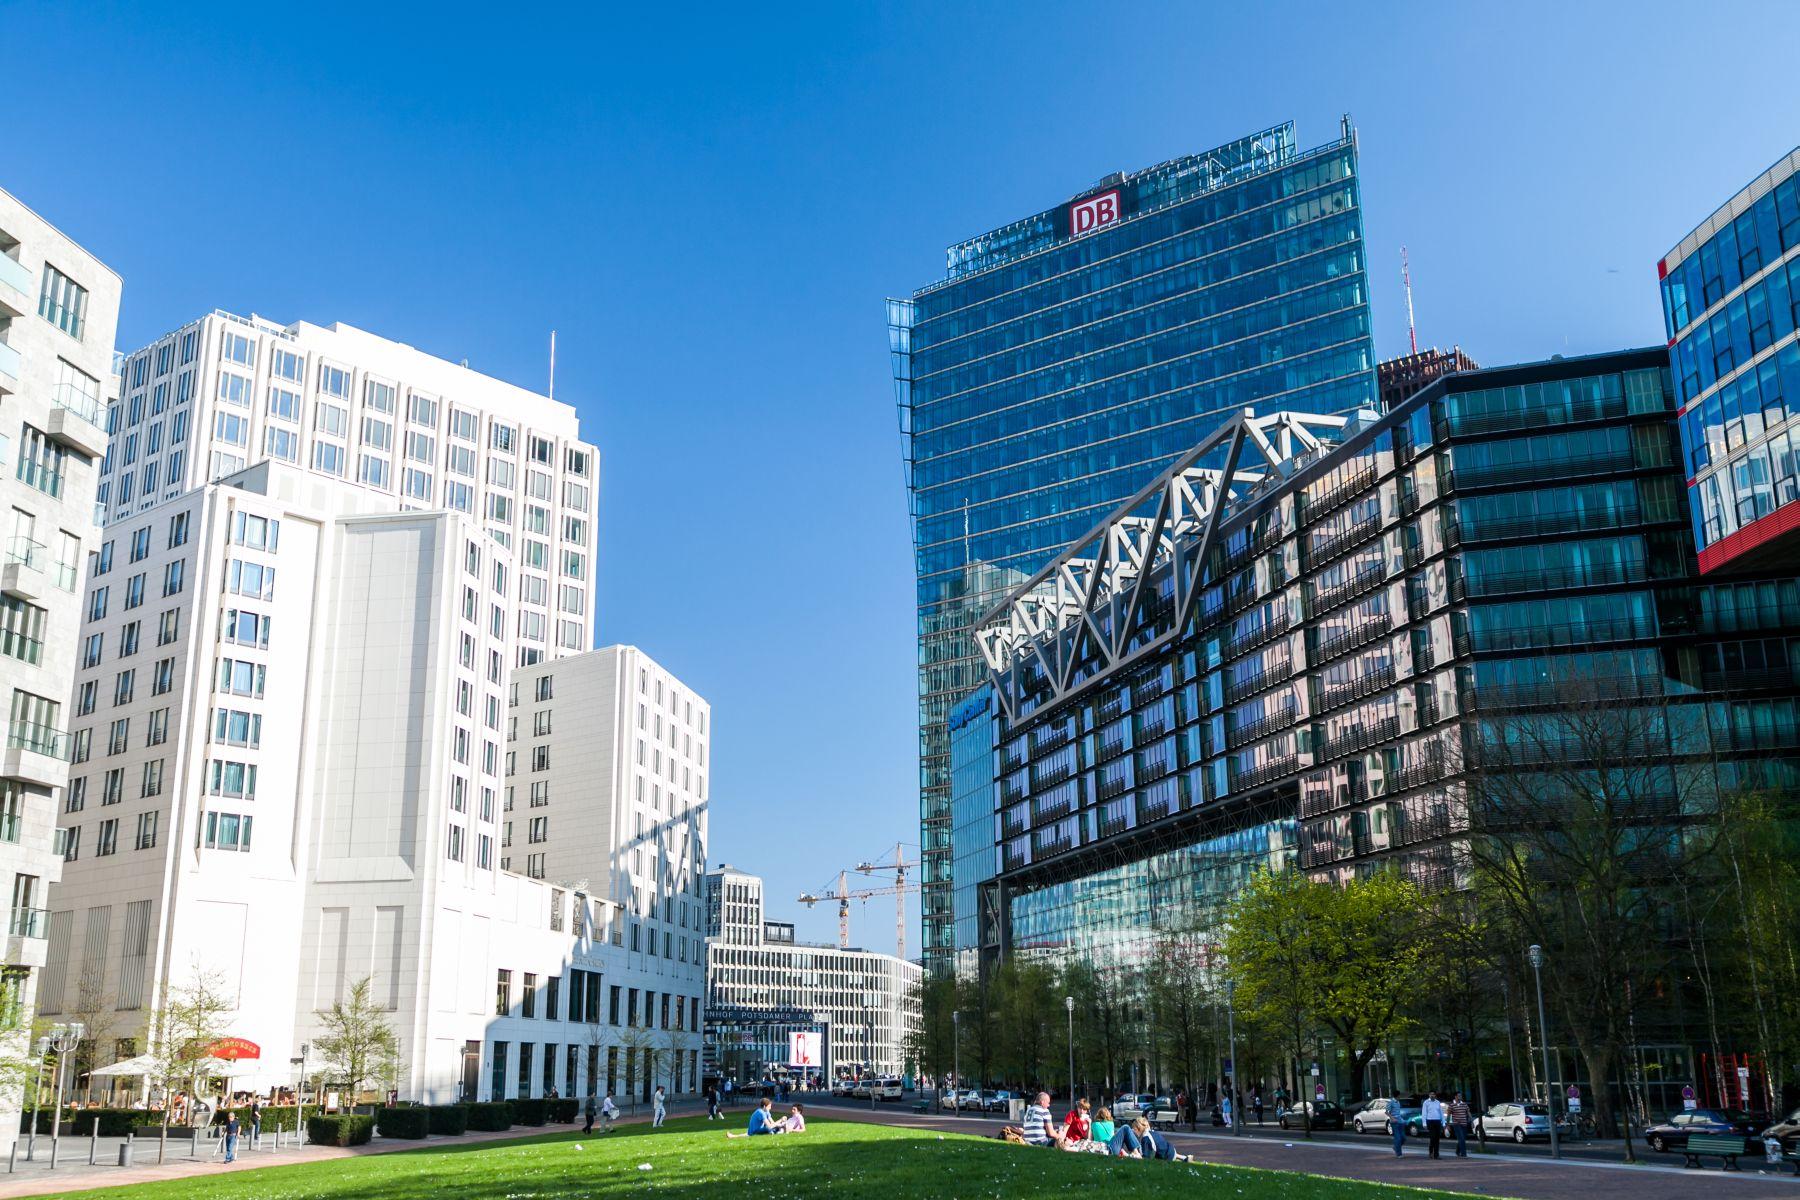 Apartamento por un Venta en Reside at the Potsdamer Platz with Ritz-Carlton Premium Service ! Berlin, Berlin, 10785 Alemania